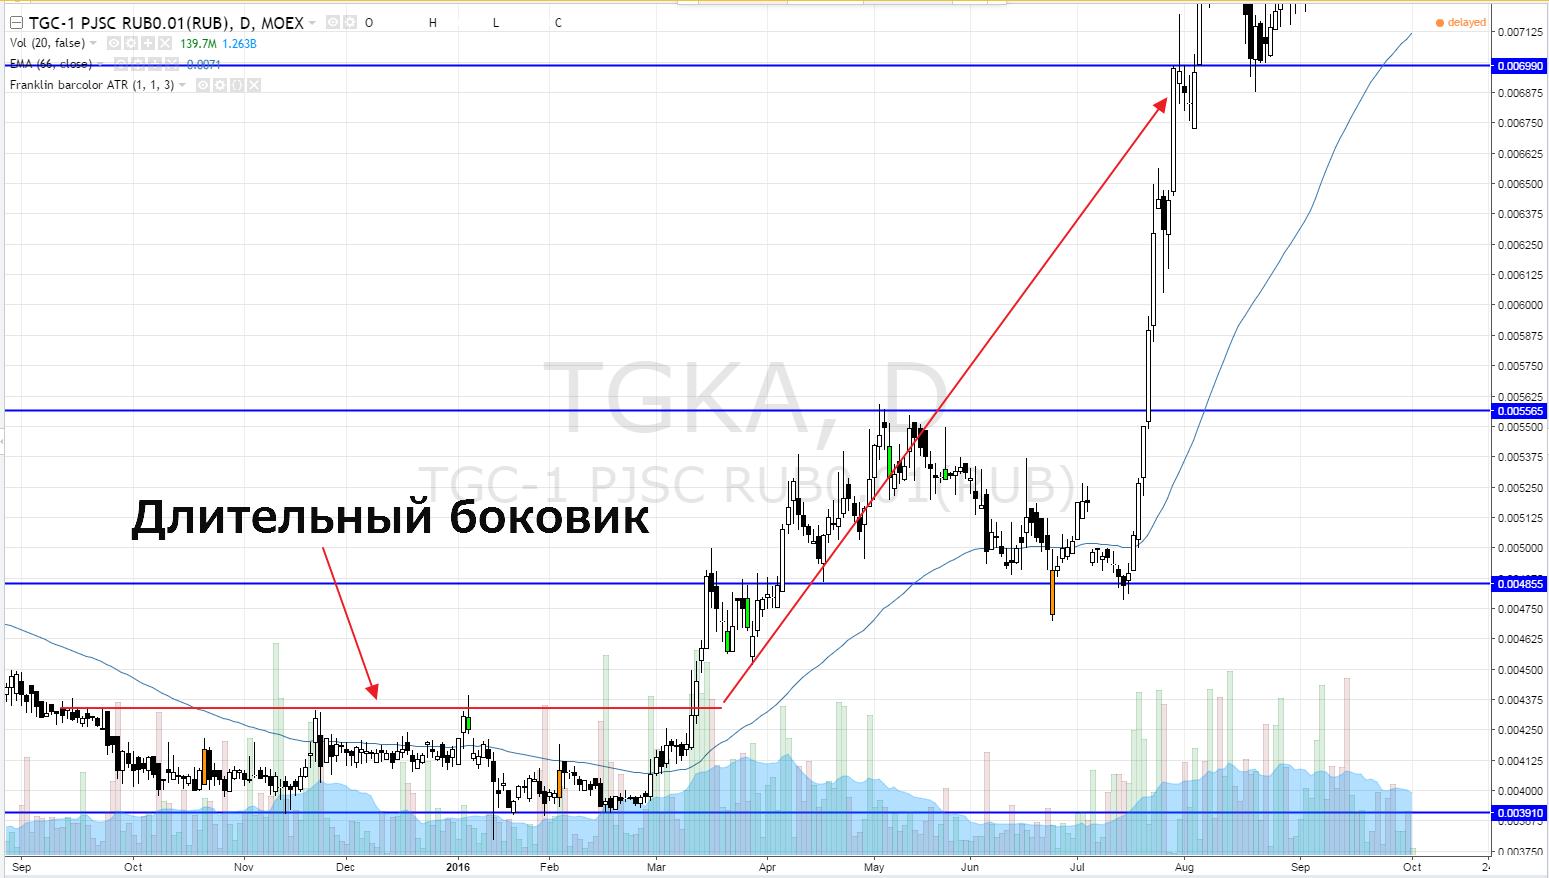 боковик-ТГК